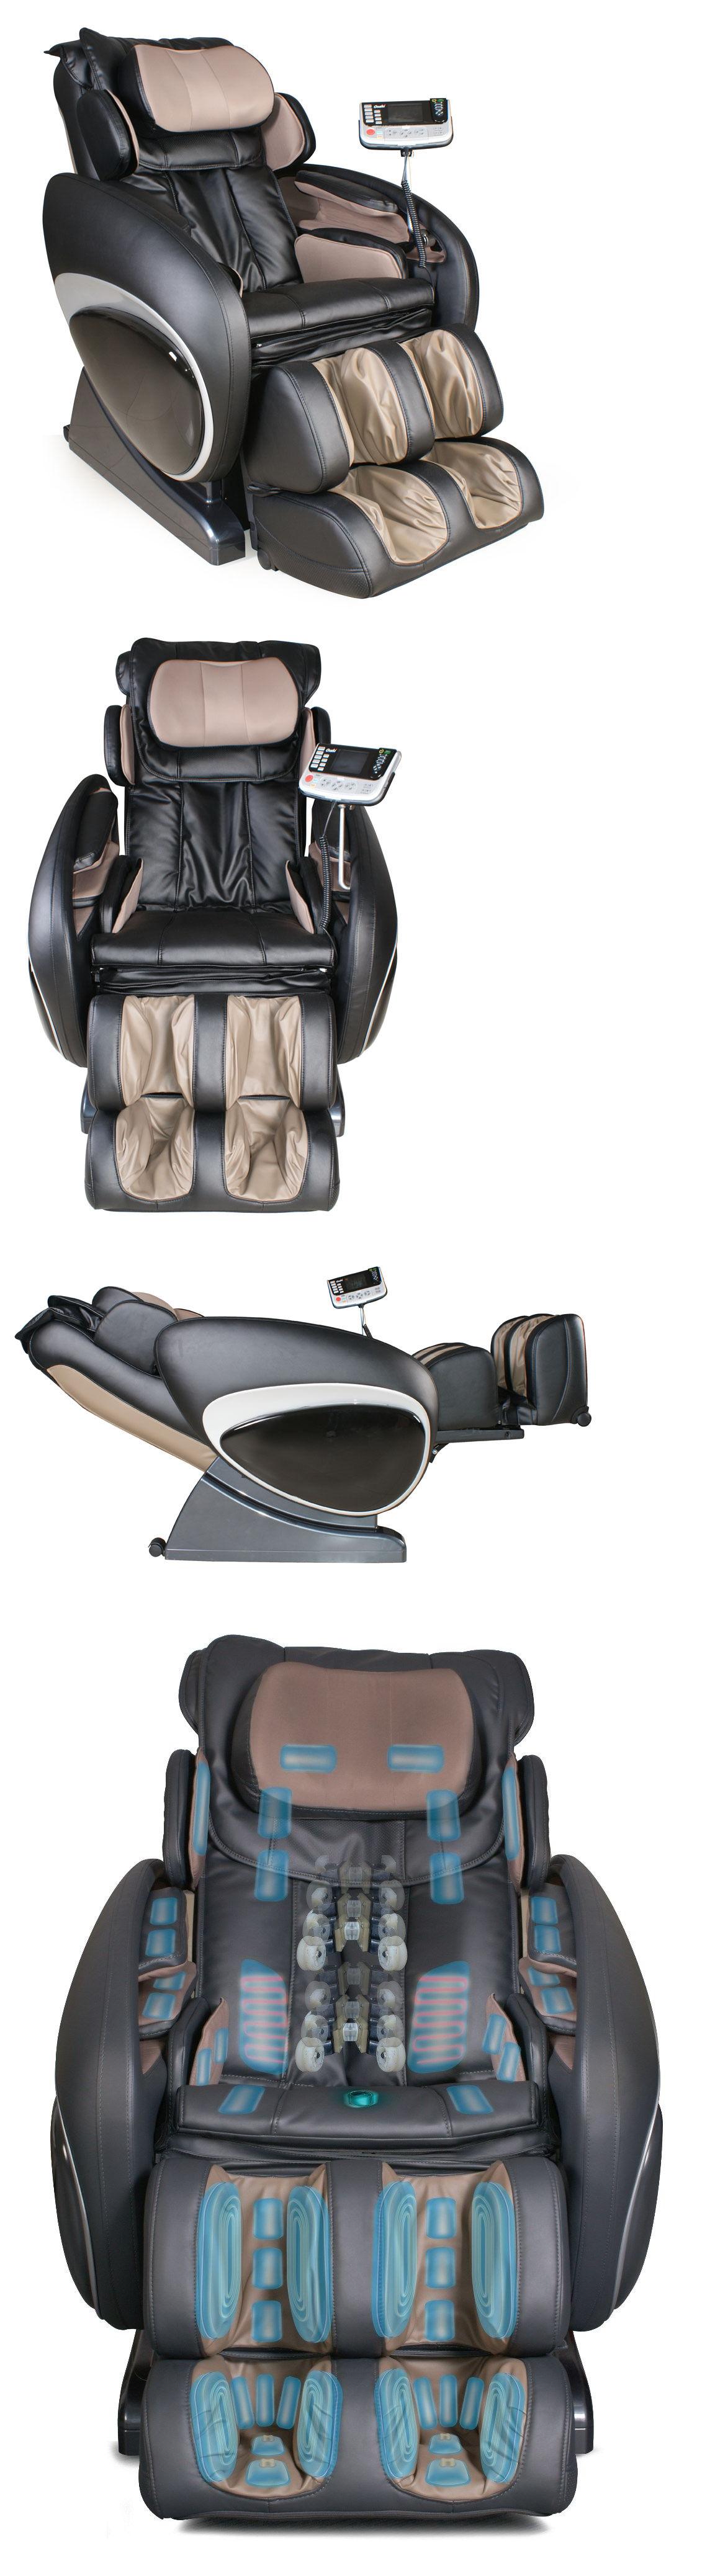 Electric massage chairs black osaki os4000 zero gravity